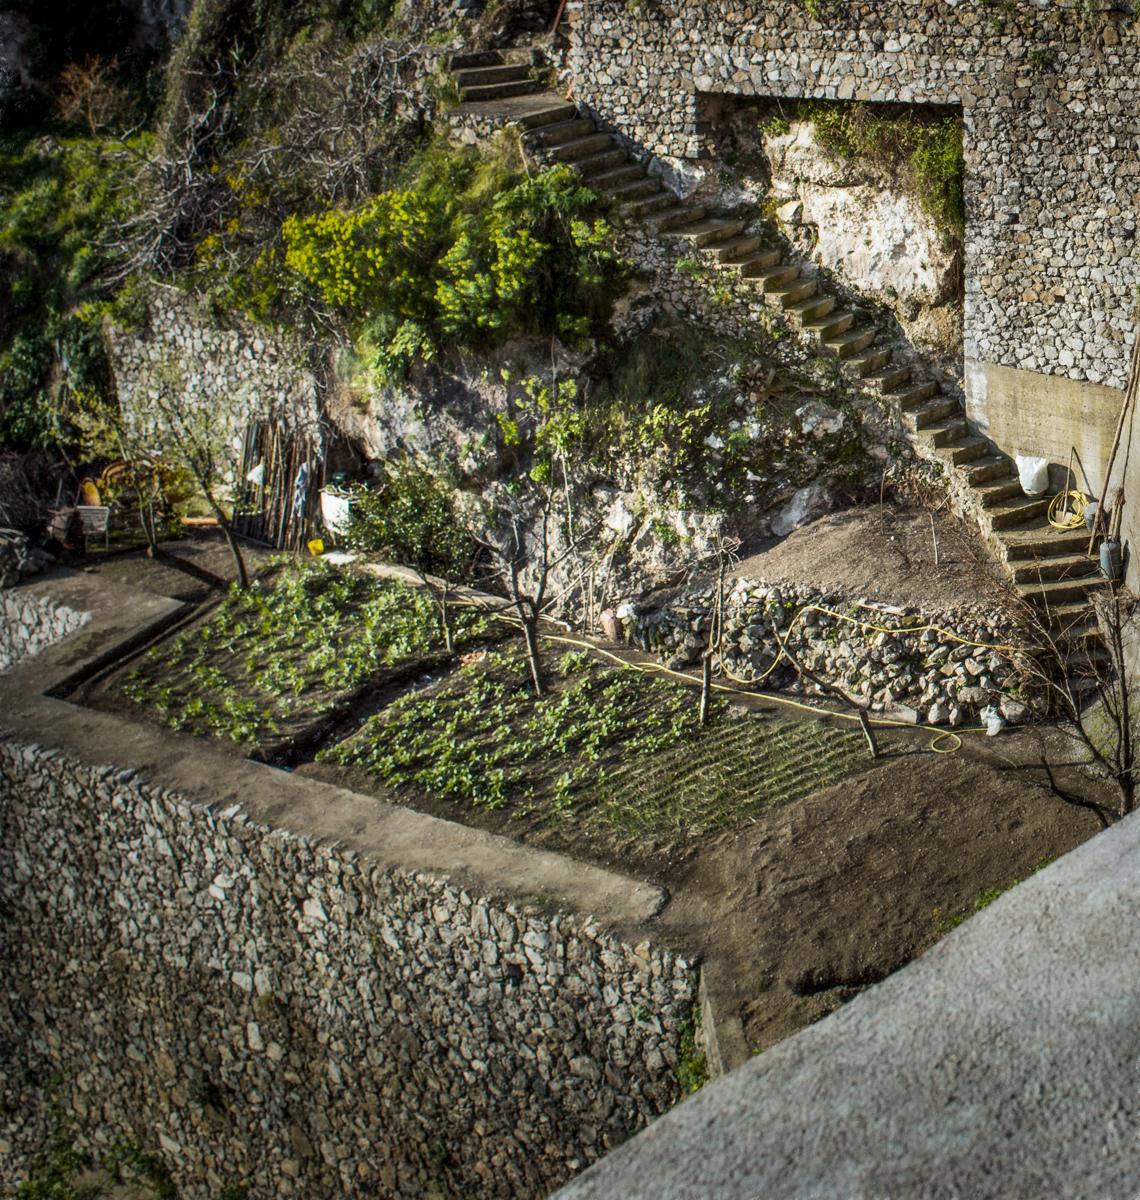 Positano_Stairs_Garden-